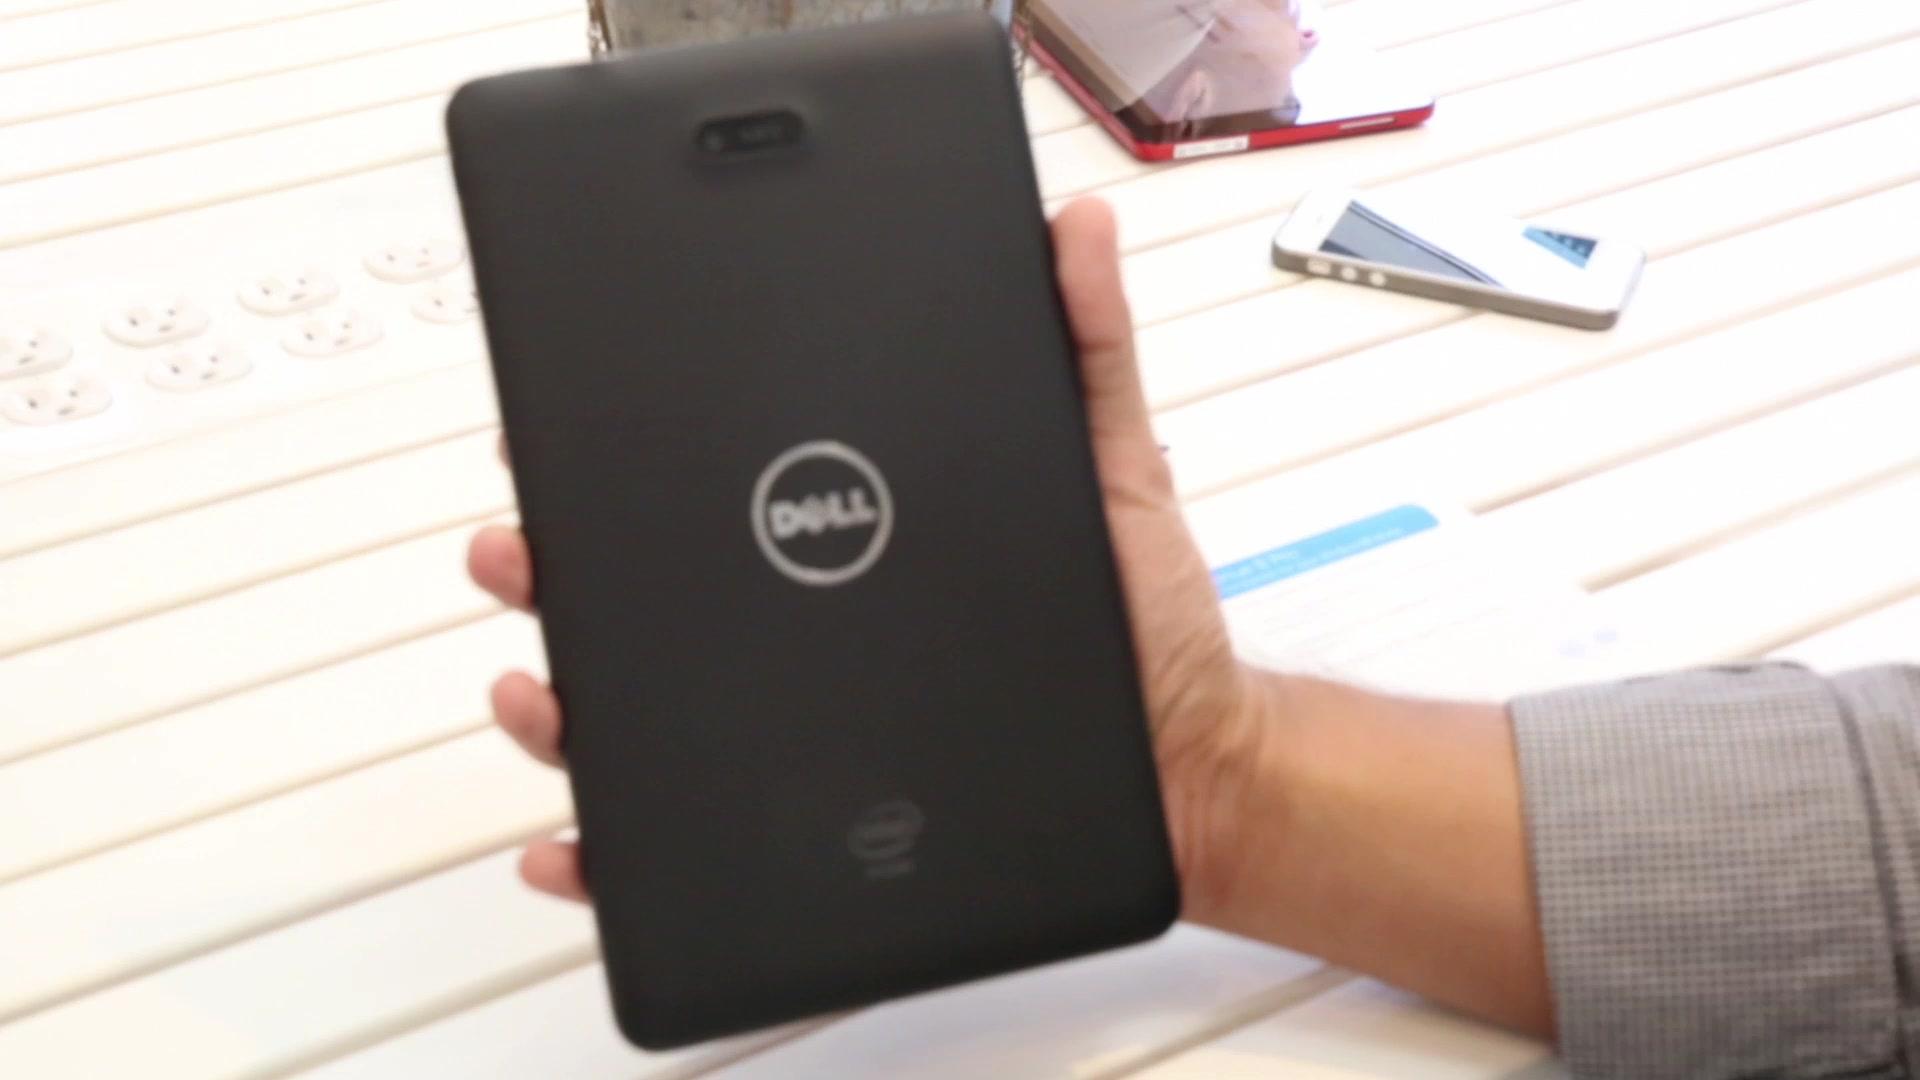 Dell Venue 8 Pro | First Look